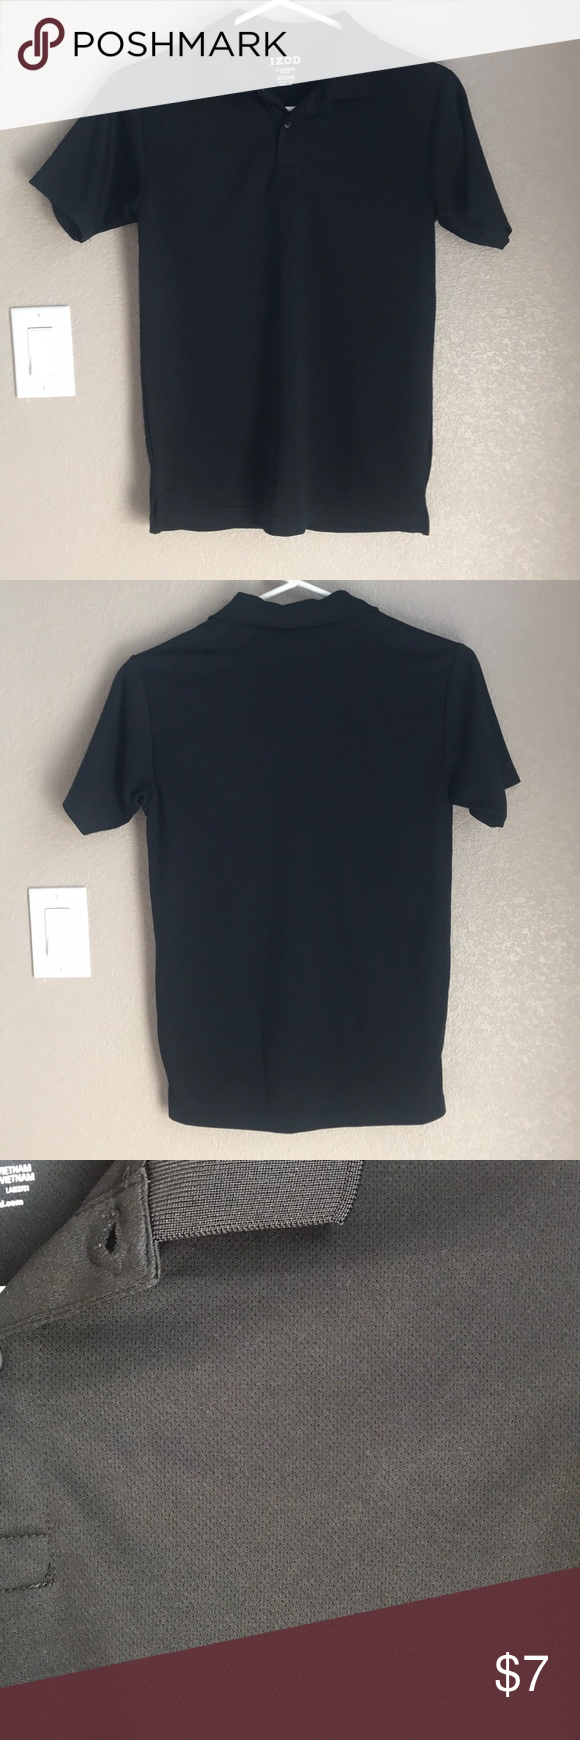 Polo Shirts Black Polo Shirt Polo Shirt Shirts